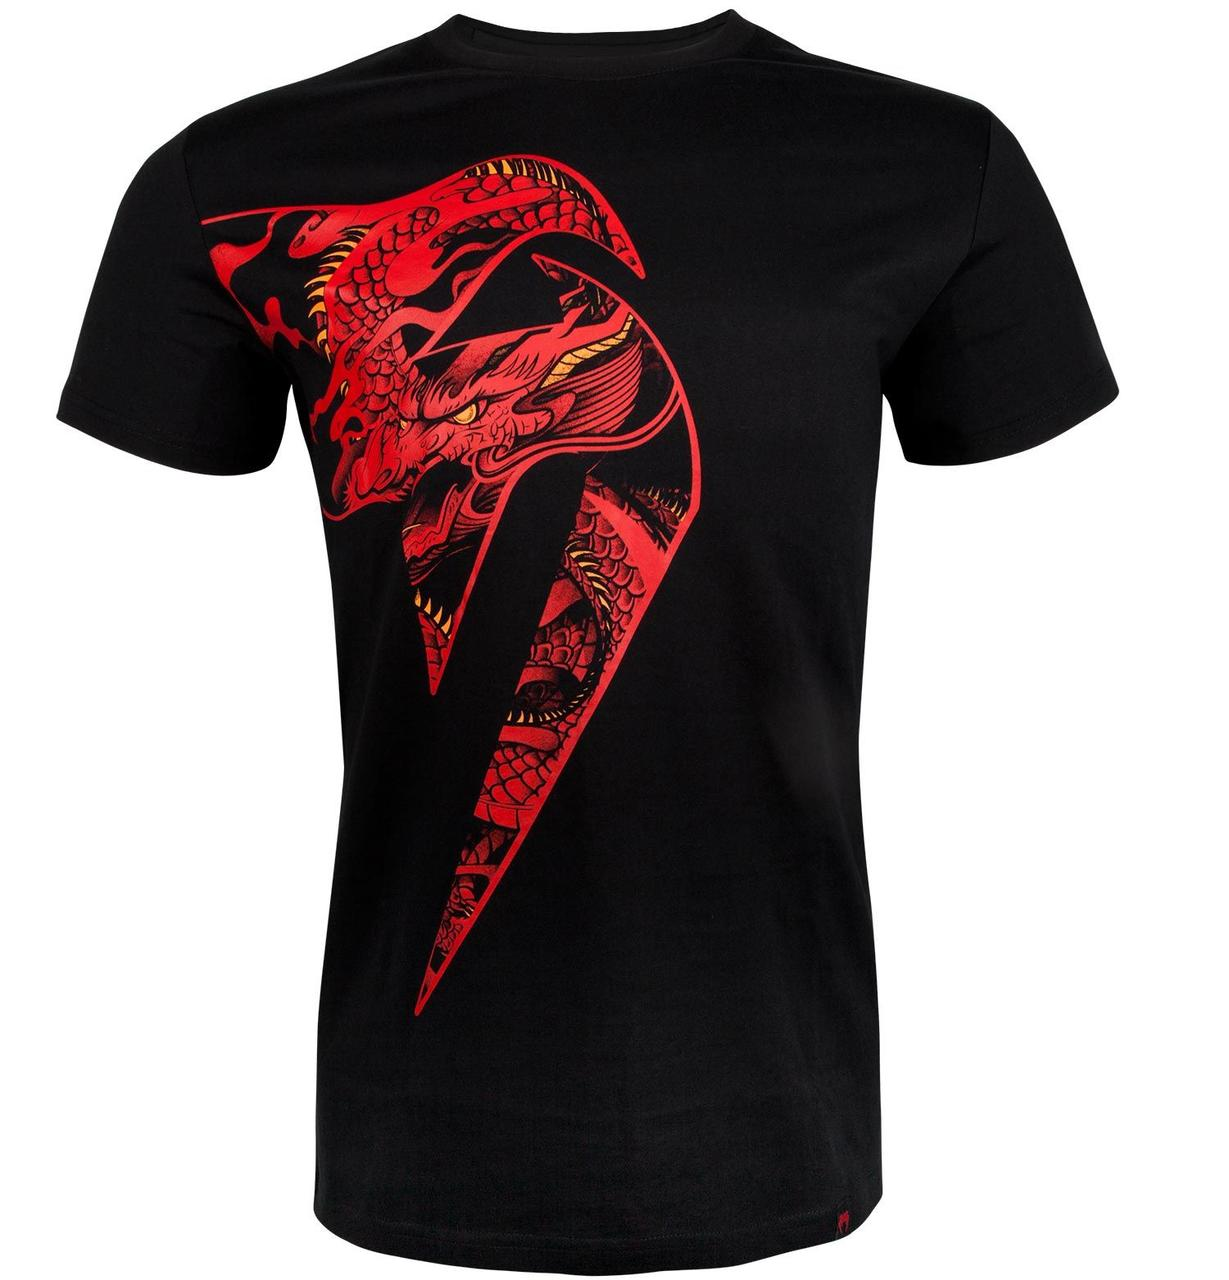 Футболка Venum Giant x Dragon T-shirt Black Red